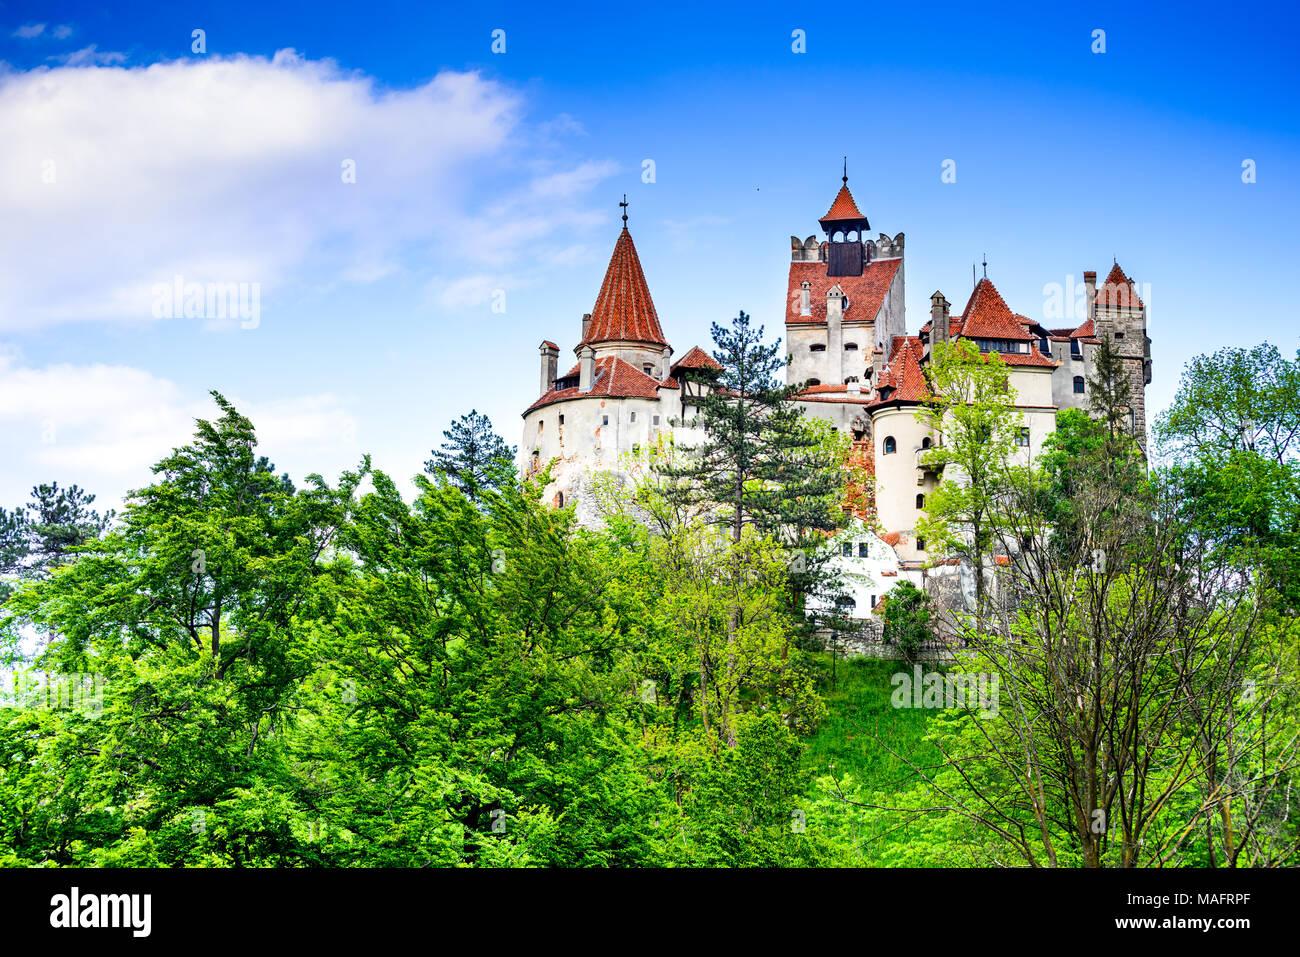 Schloss Bran, Rumänien. Atemberaubender Frühling Bild von Draculas Schloss in Kronstadt, Siebenbürgen, Osteuropa. Stockbild